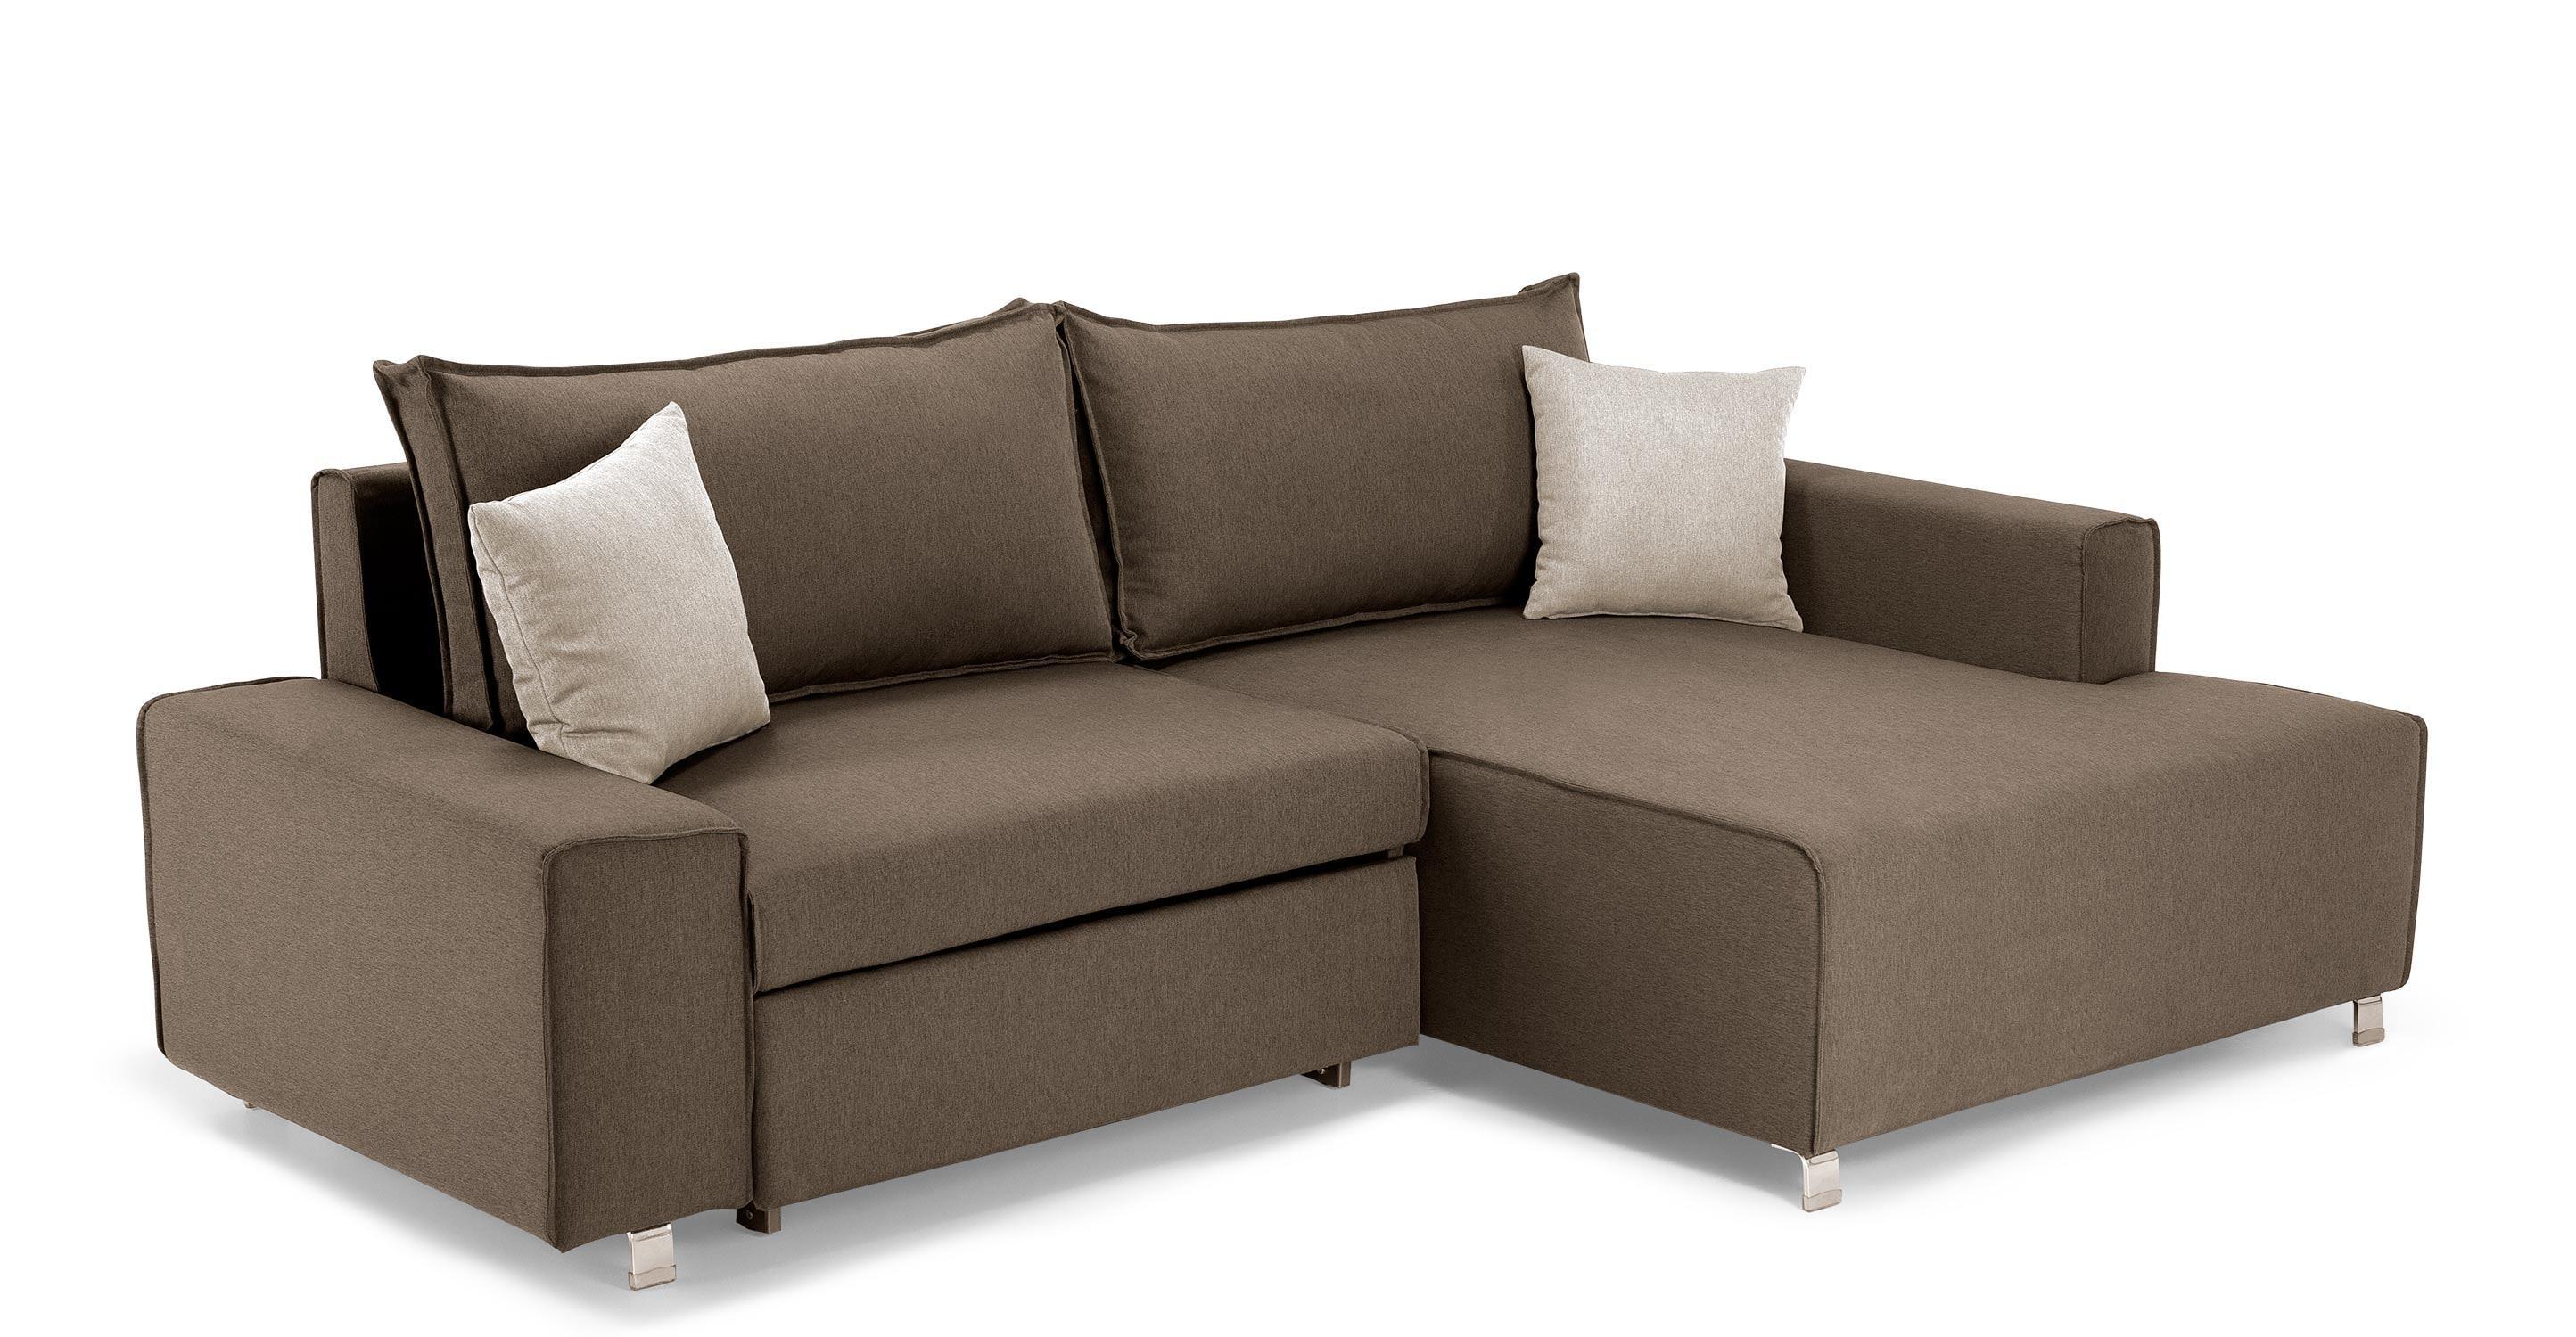 best cheap sofas uk sofa recovering fabrics 20 corner ideas